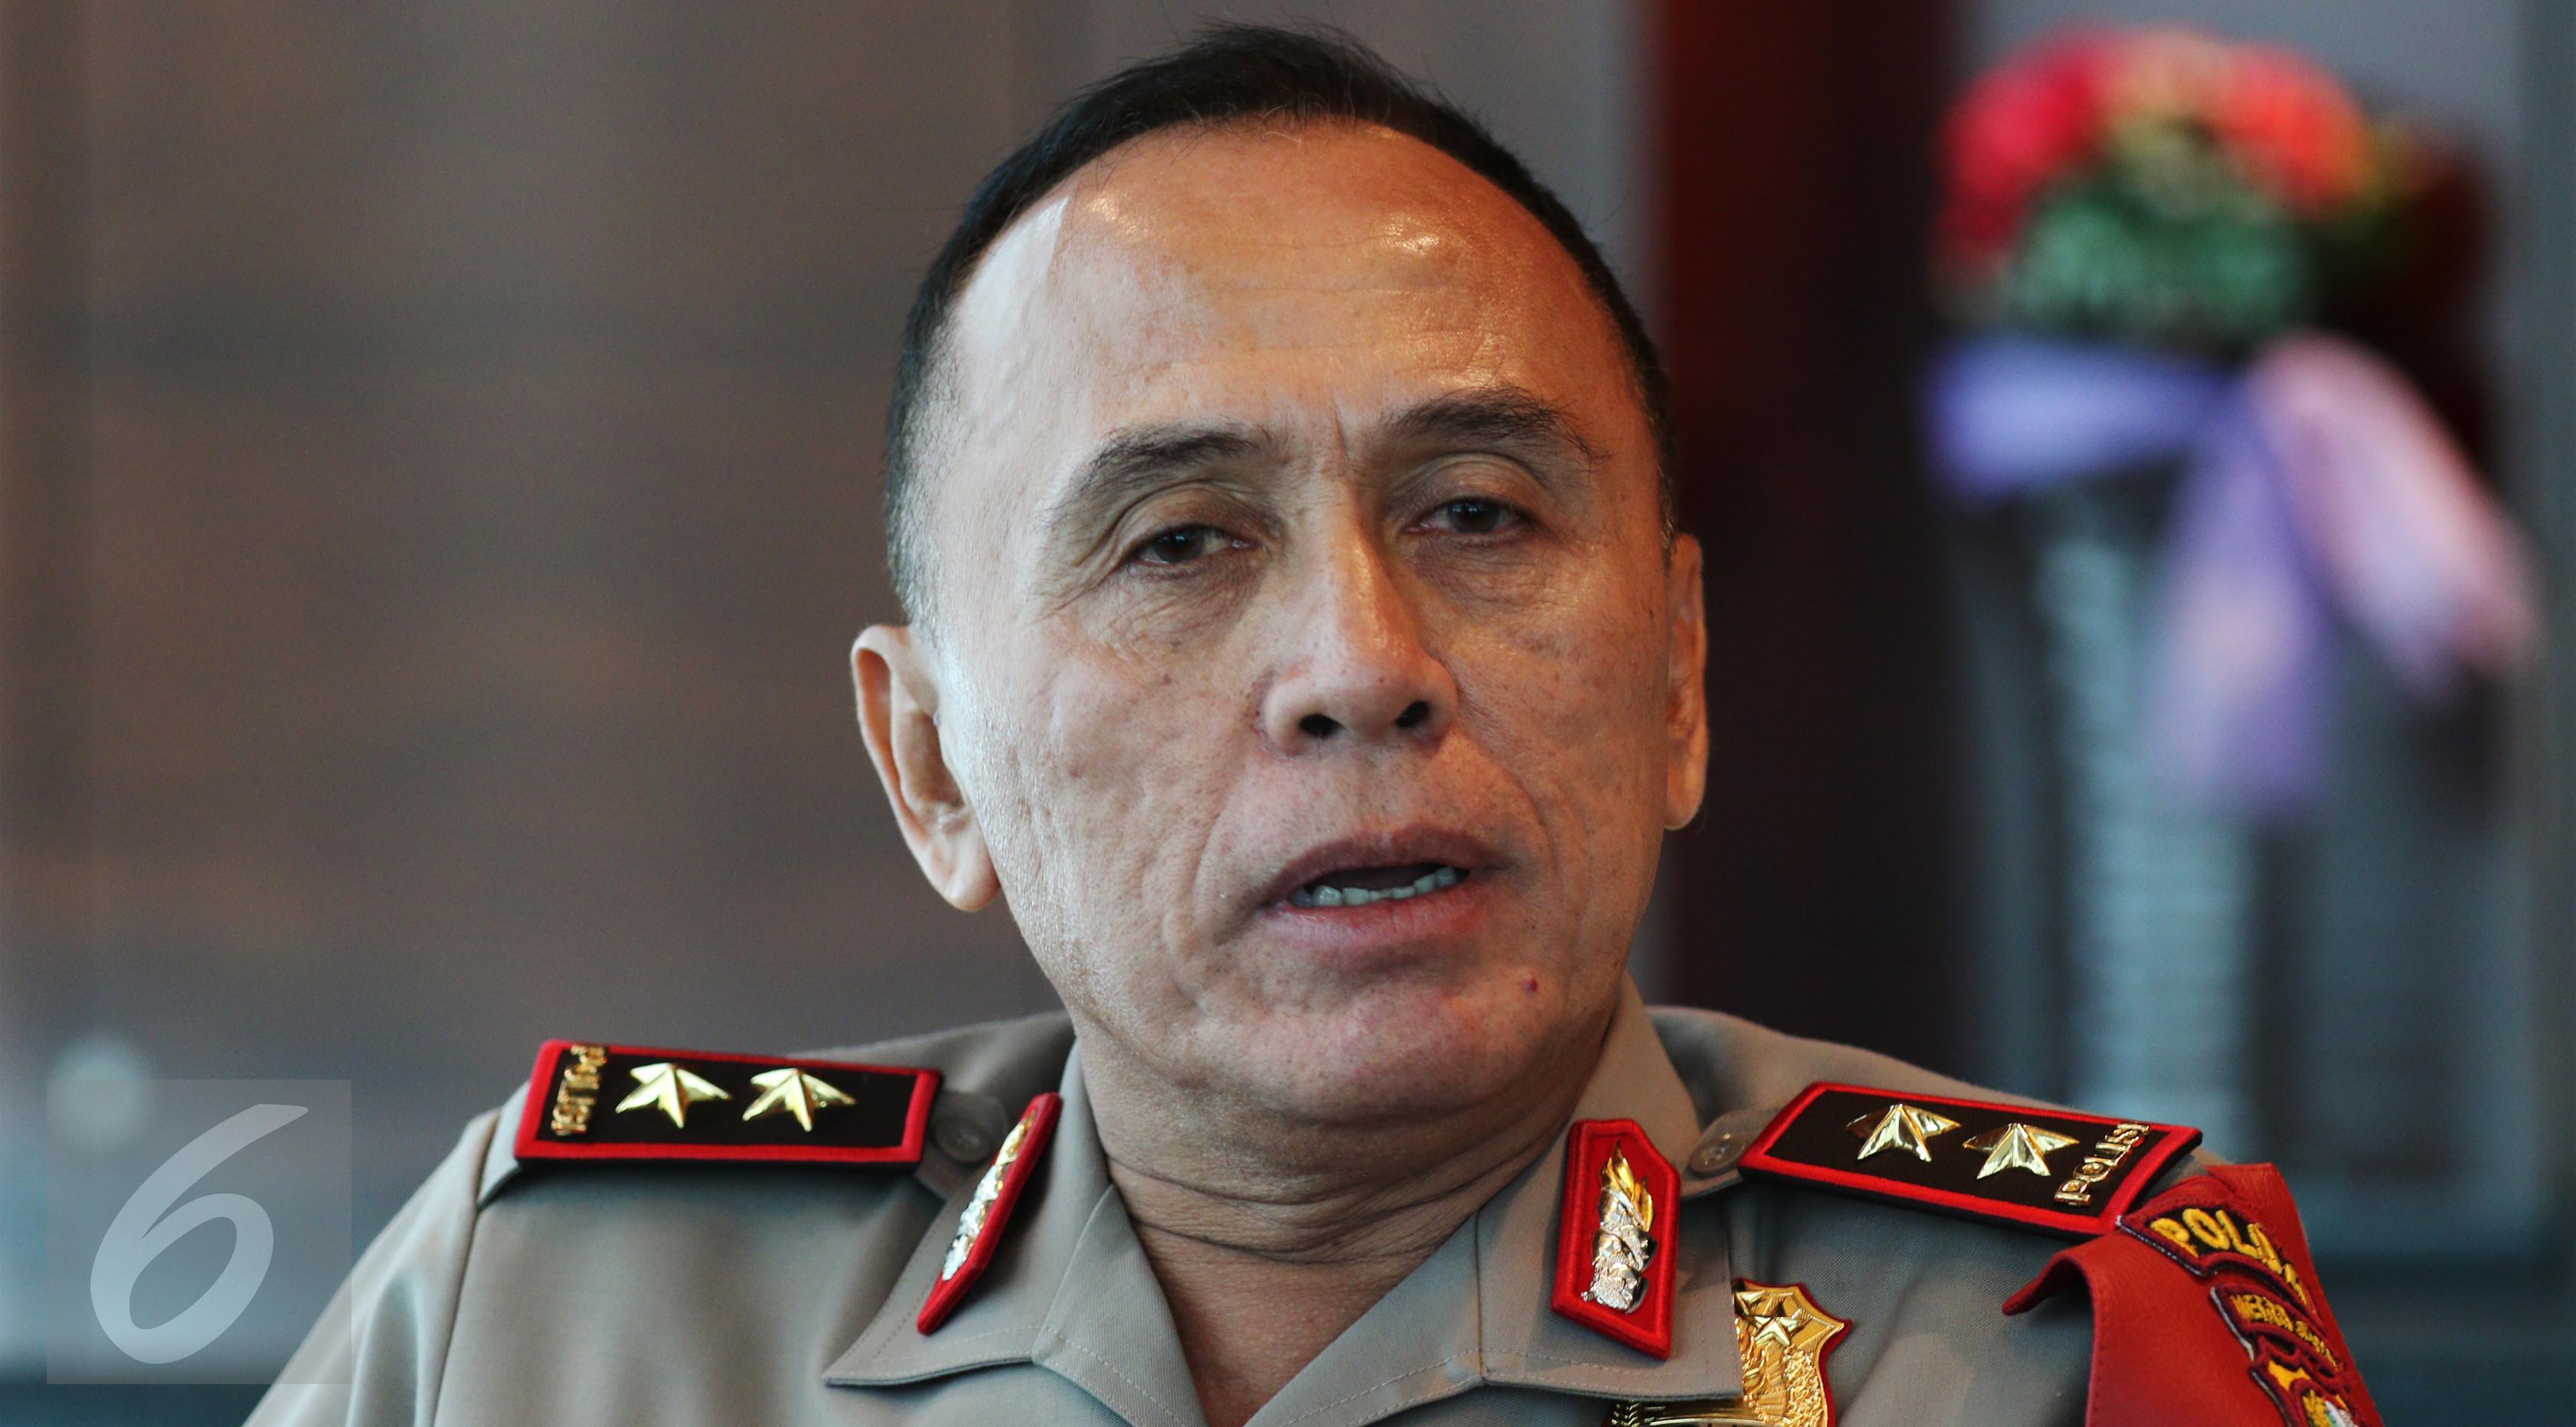 Kapolda Metro Jaya Irjen. Pol. Drs. Mochamad Iriawan saat berkunjung ke SCTV Tower, Jakarta, Senin (20/2). (Liputan6.com/Fatkhur Rozaq)